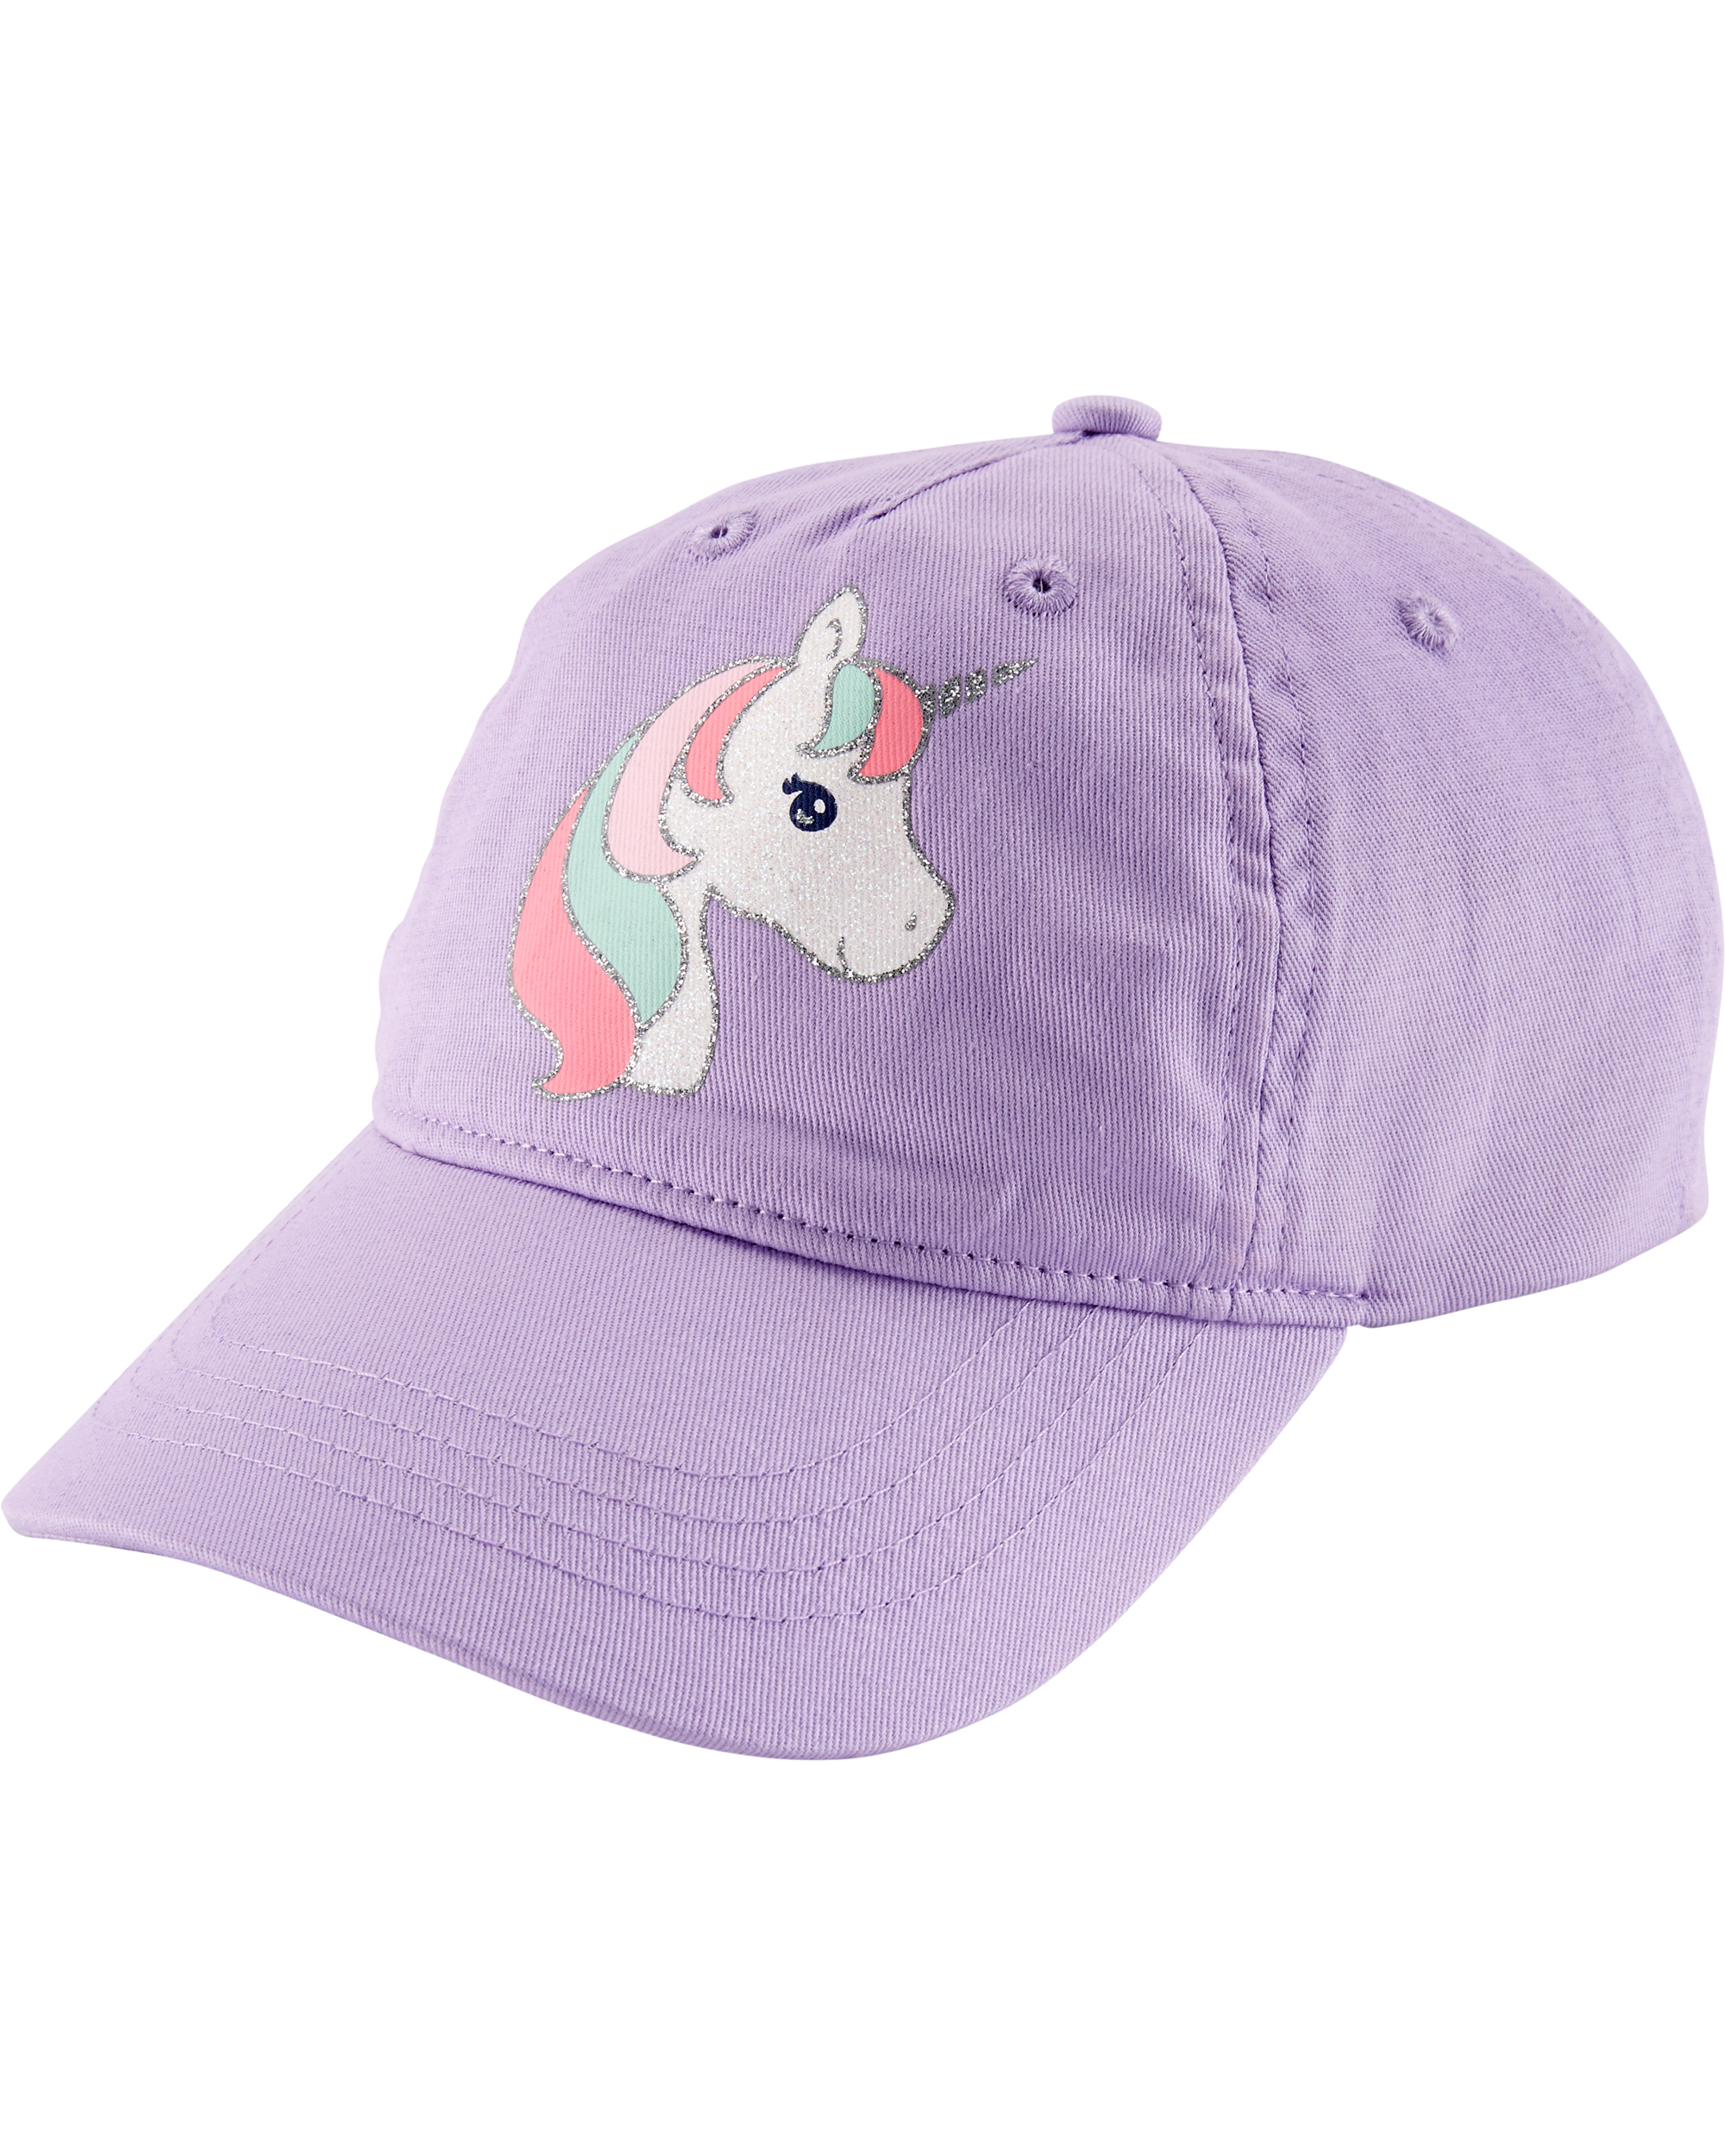 כובע מצחייה חד קרן